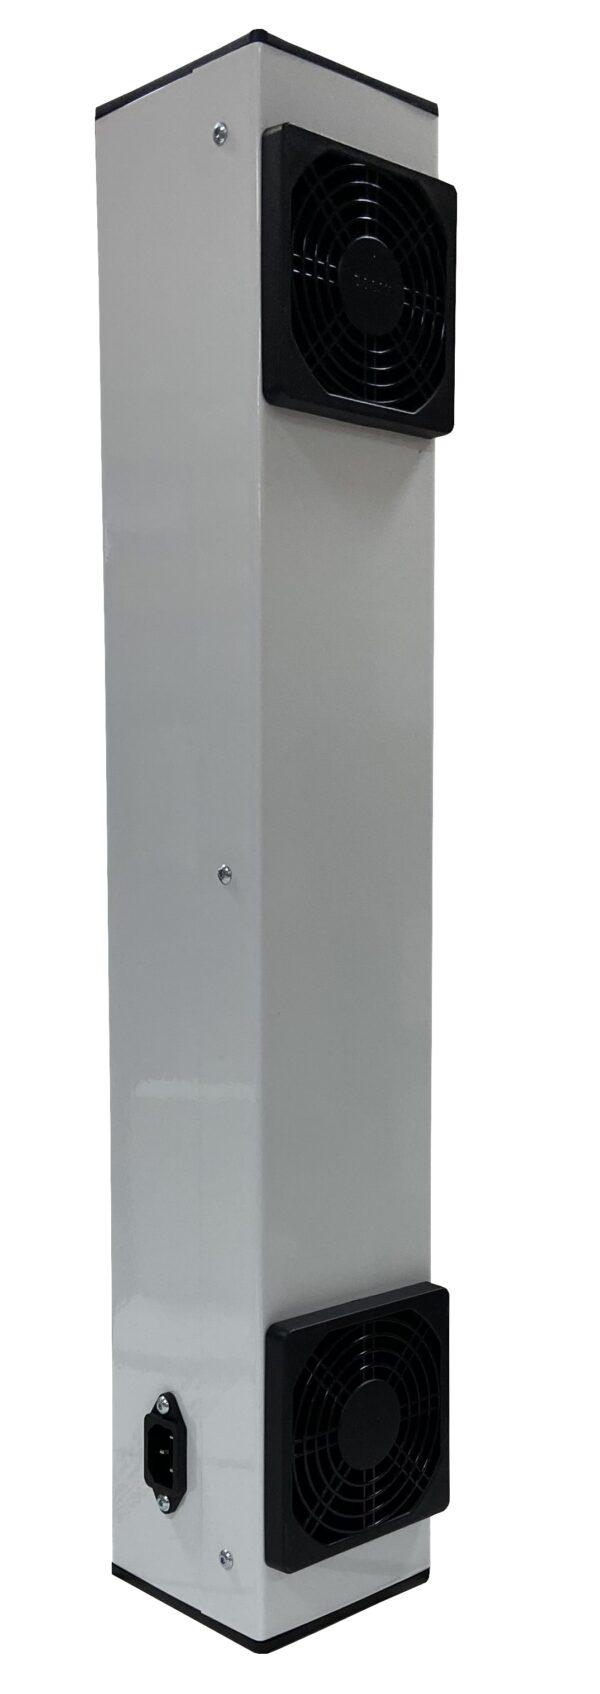 РБО01-2х15-011 ОБРИОН-2